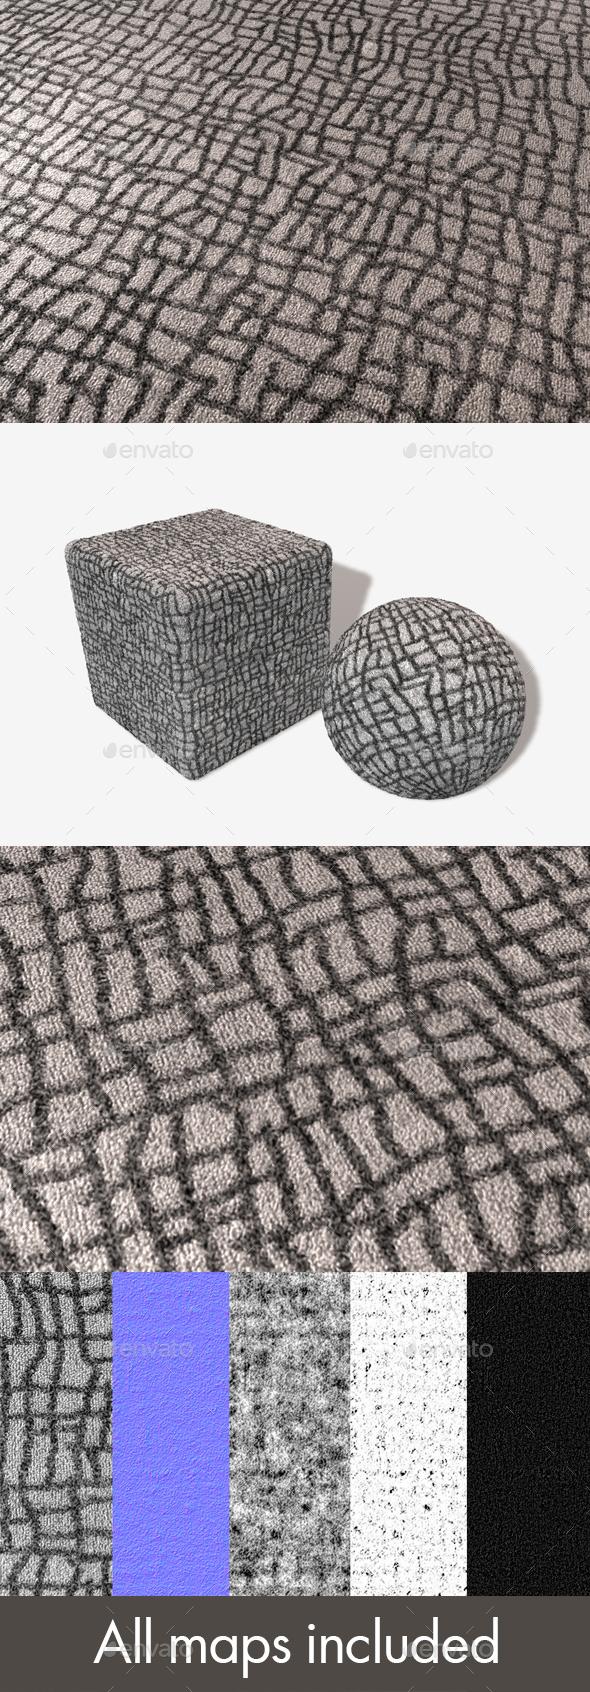 Grey Sketch Carpet Seamless Texture - 3DOcean Item for Sale